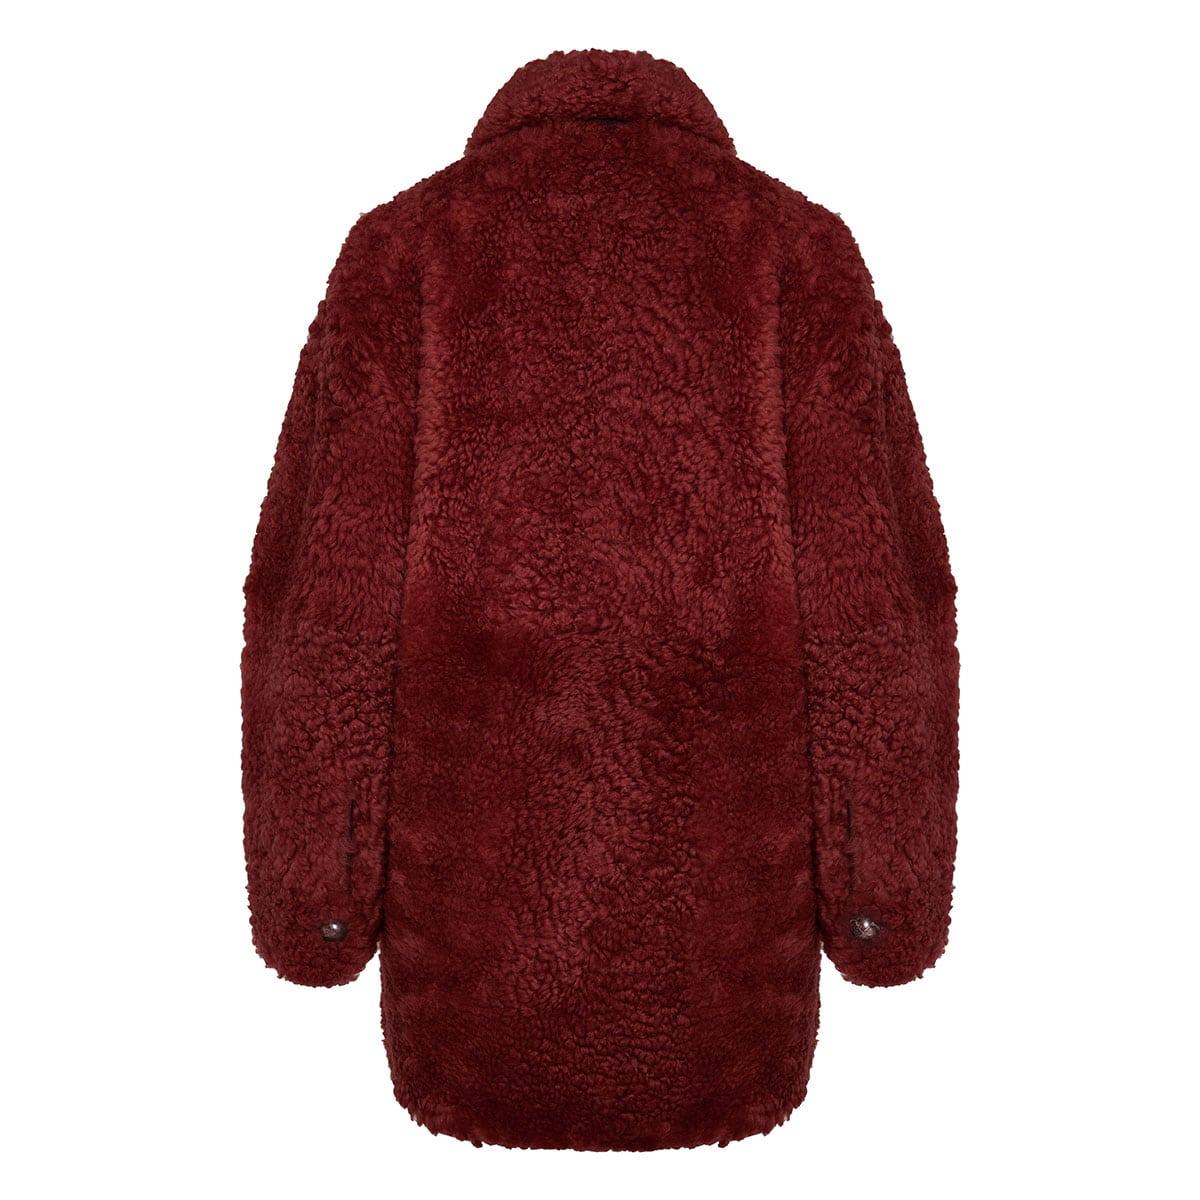 Sarvey oversized shearling coat